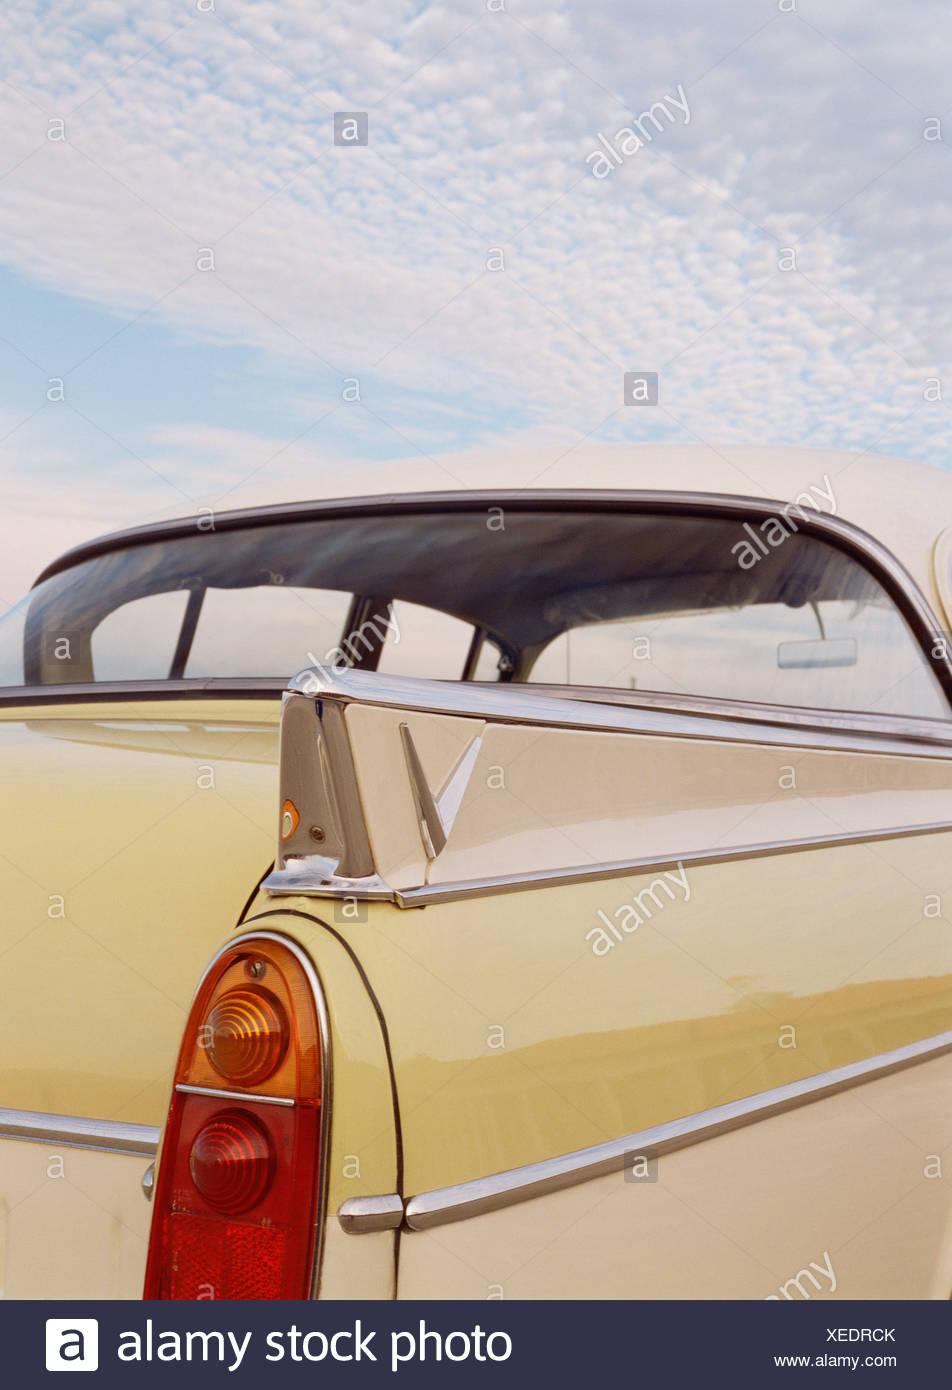 Transport. Straßenfahrzeuge. Jahrgang. classic car. 1950. Vauxhall Cresta. britischen. close-up des hinteren Kotflügels. Stockbild